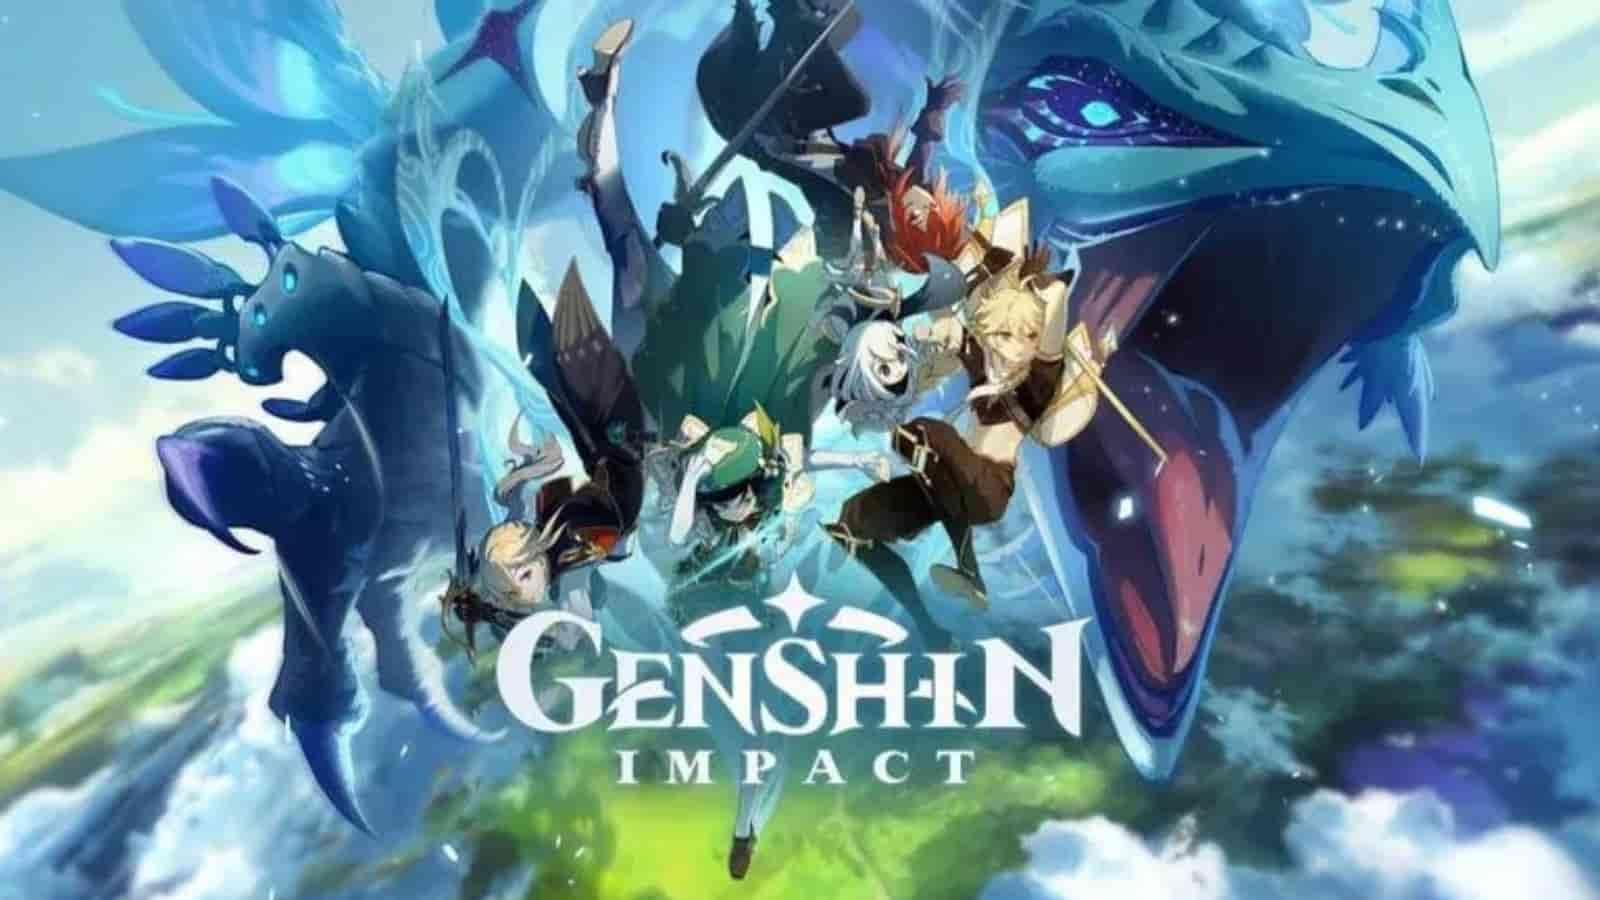 Genshin Impact Redeem Codes for August 2021: Free Primogems